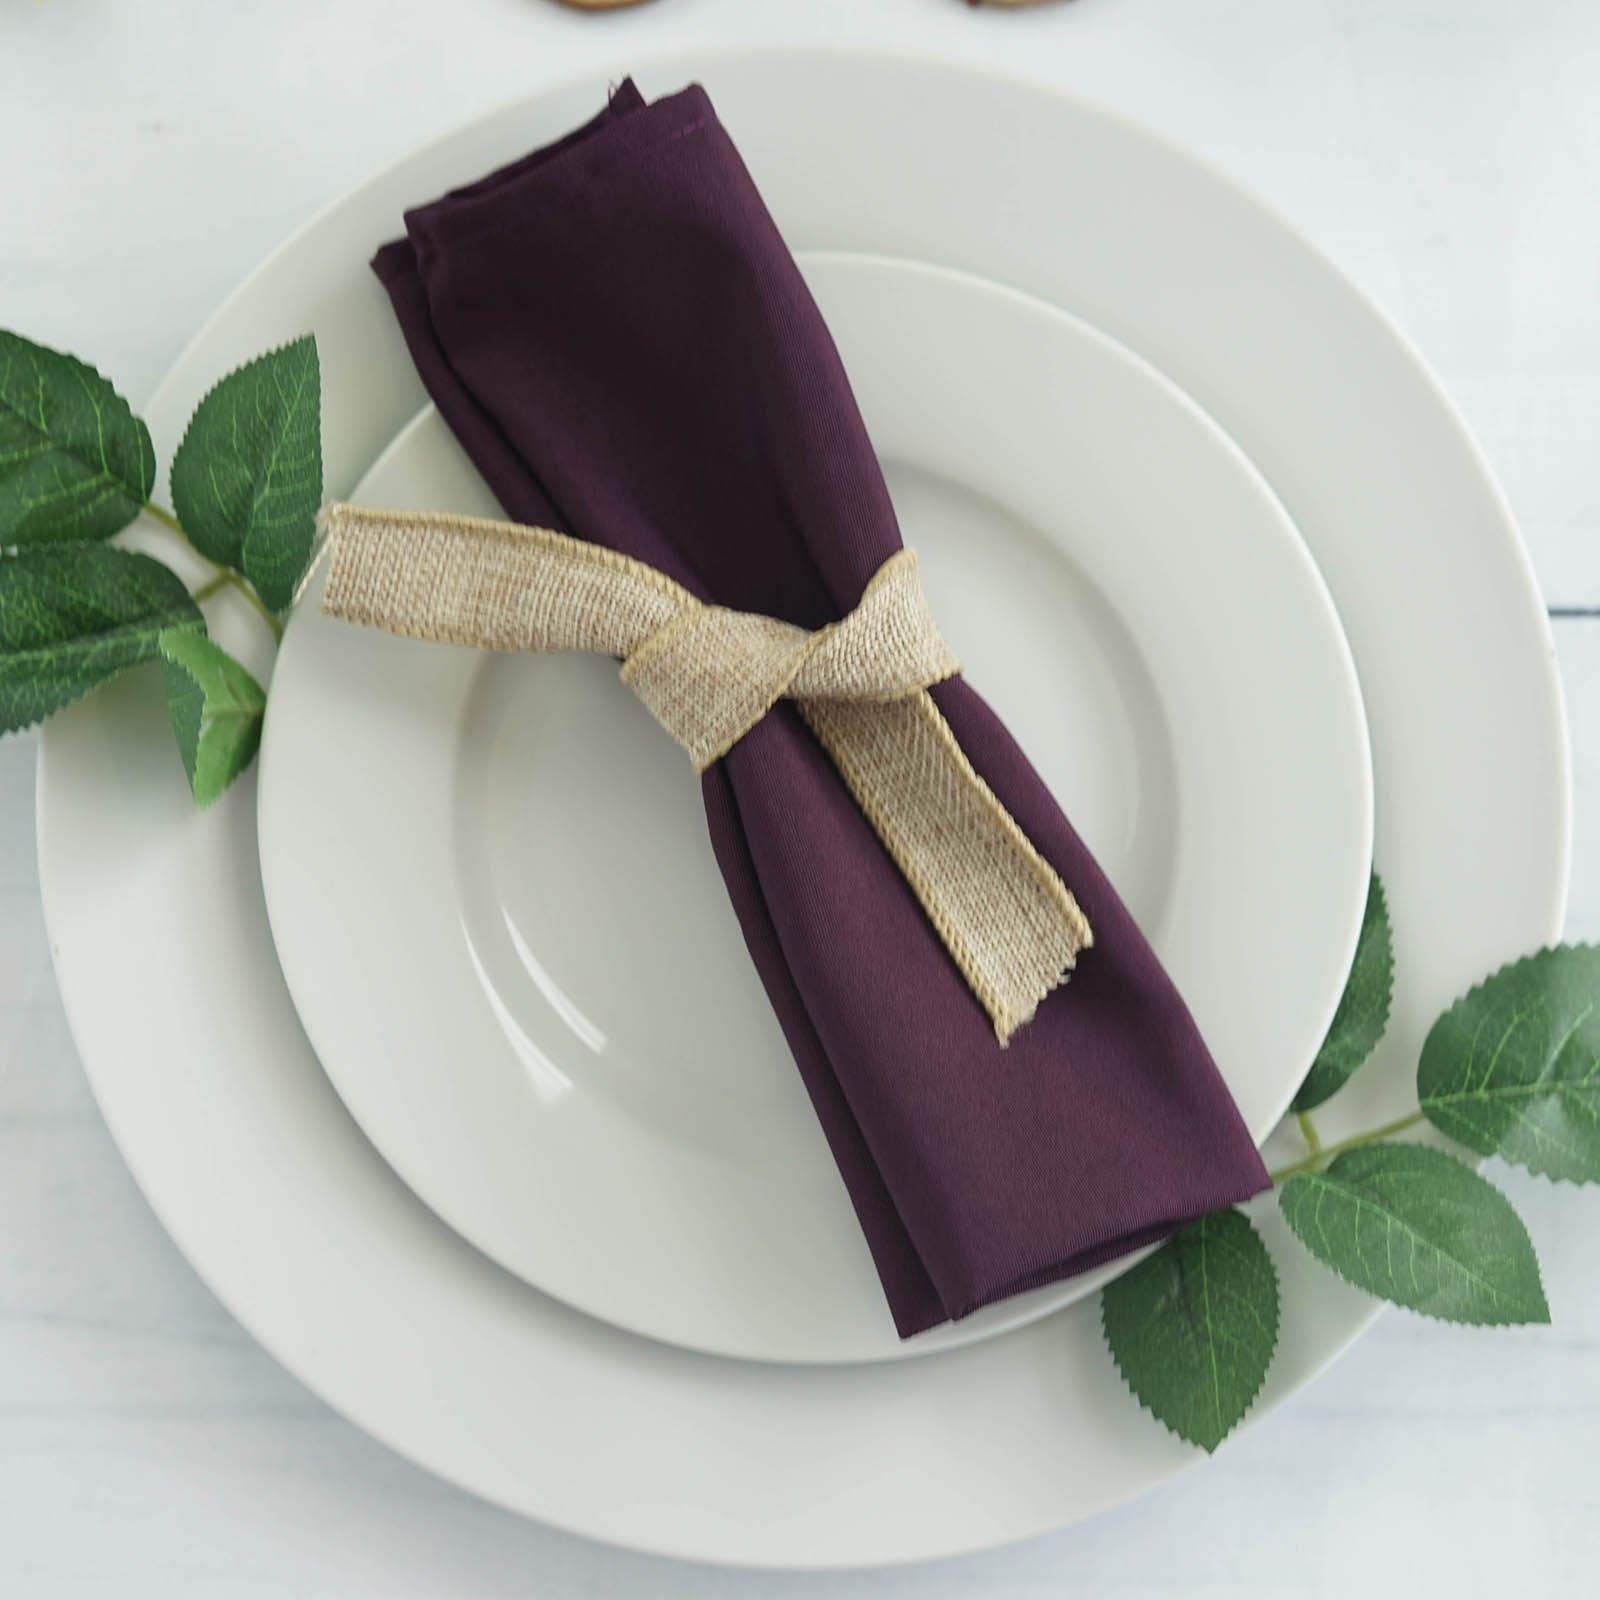 10 Eggplant Purple Polyester 20x20 Wedding Napkins Table Linens Decorations Ebay